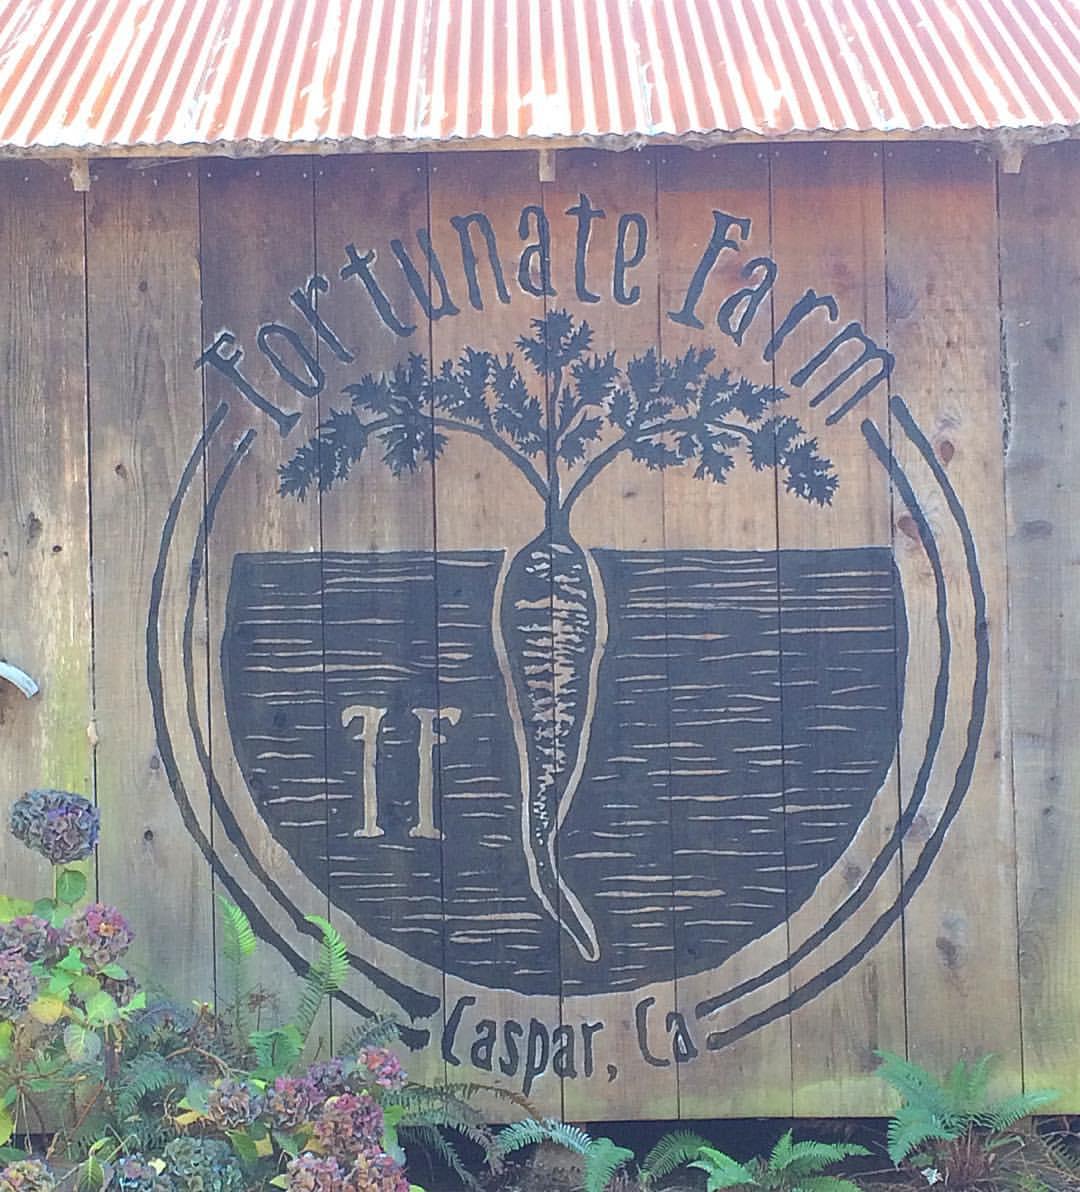 FORTUNATE FARM - CASPAR